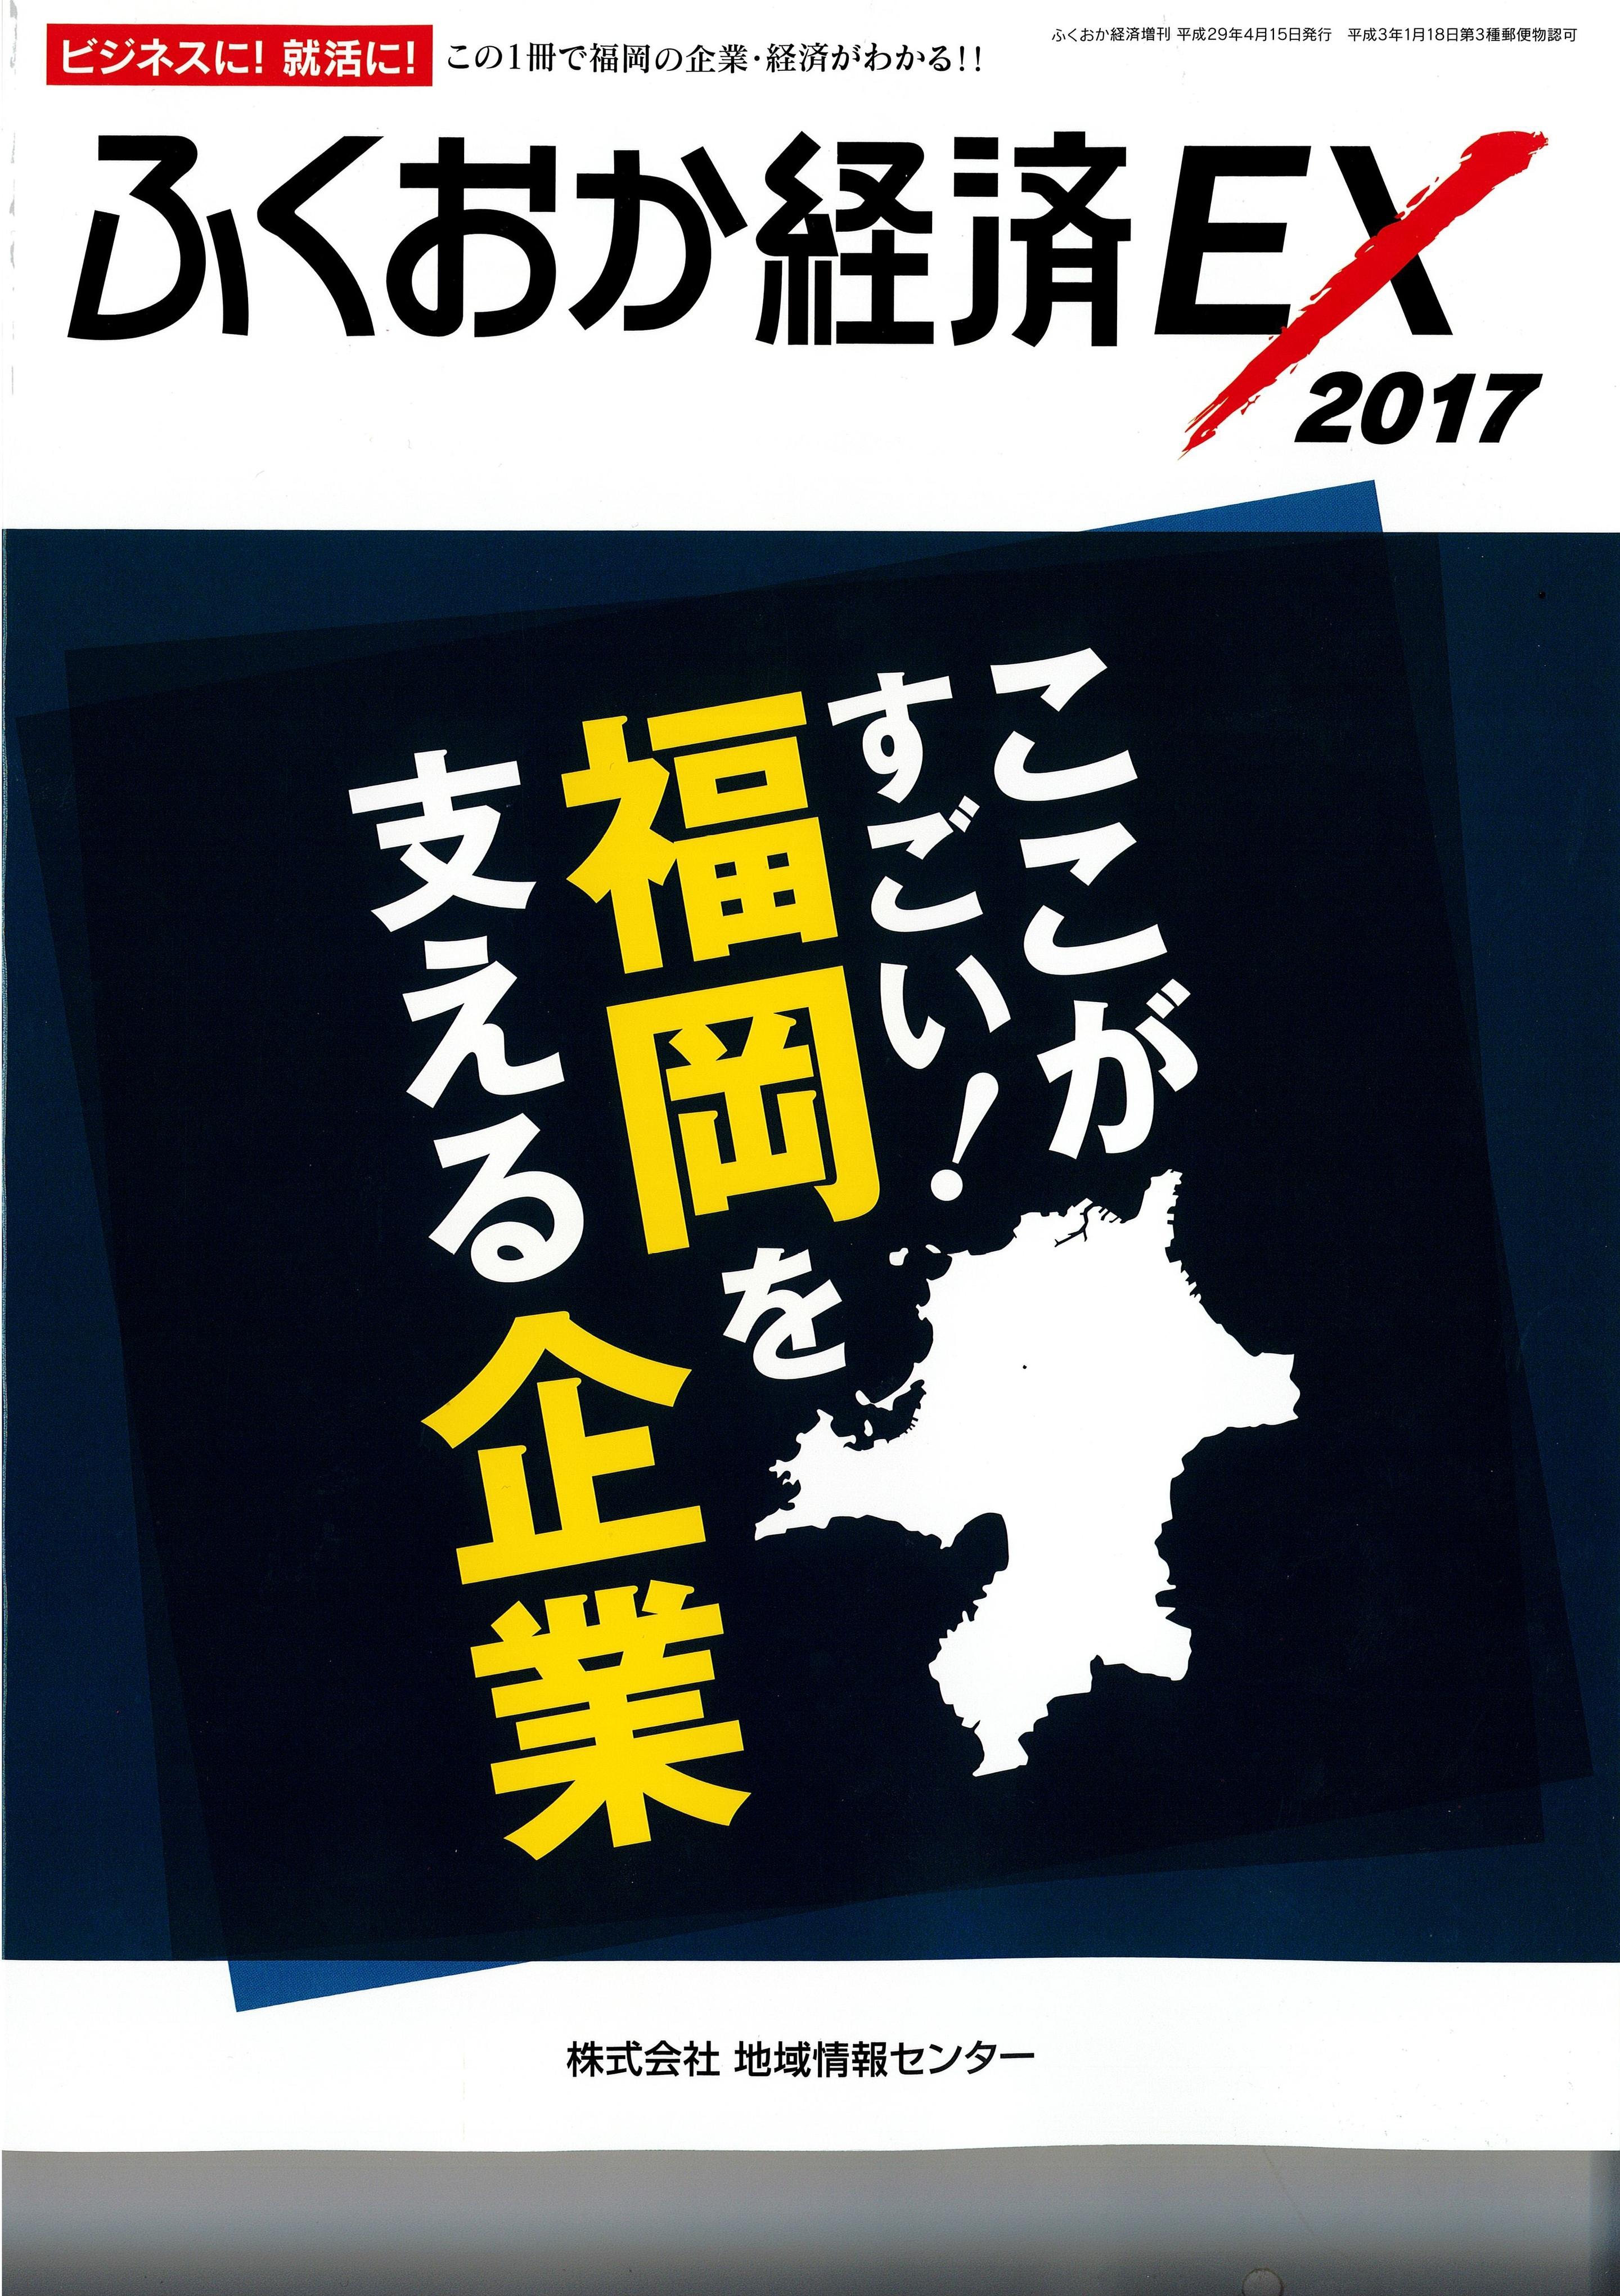 fukuokakeizaiEX